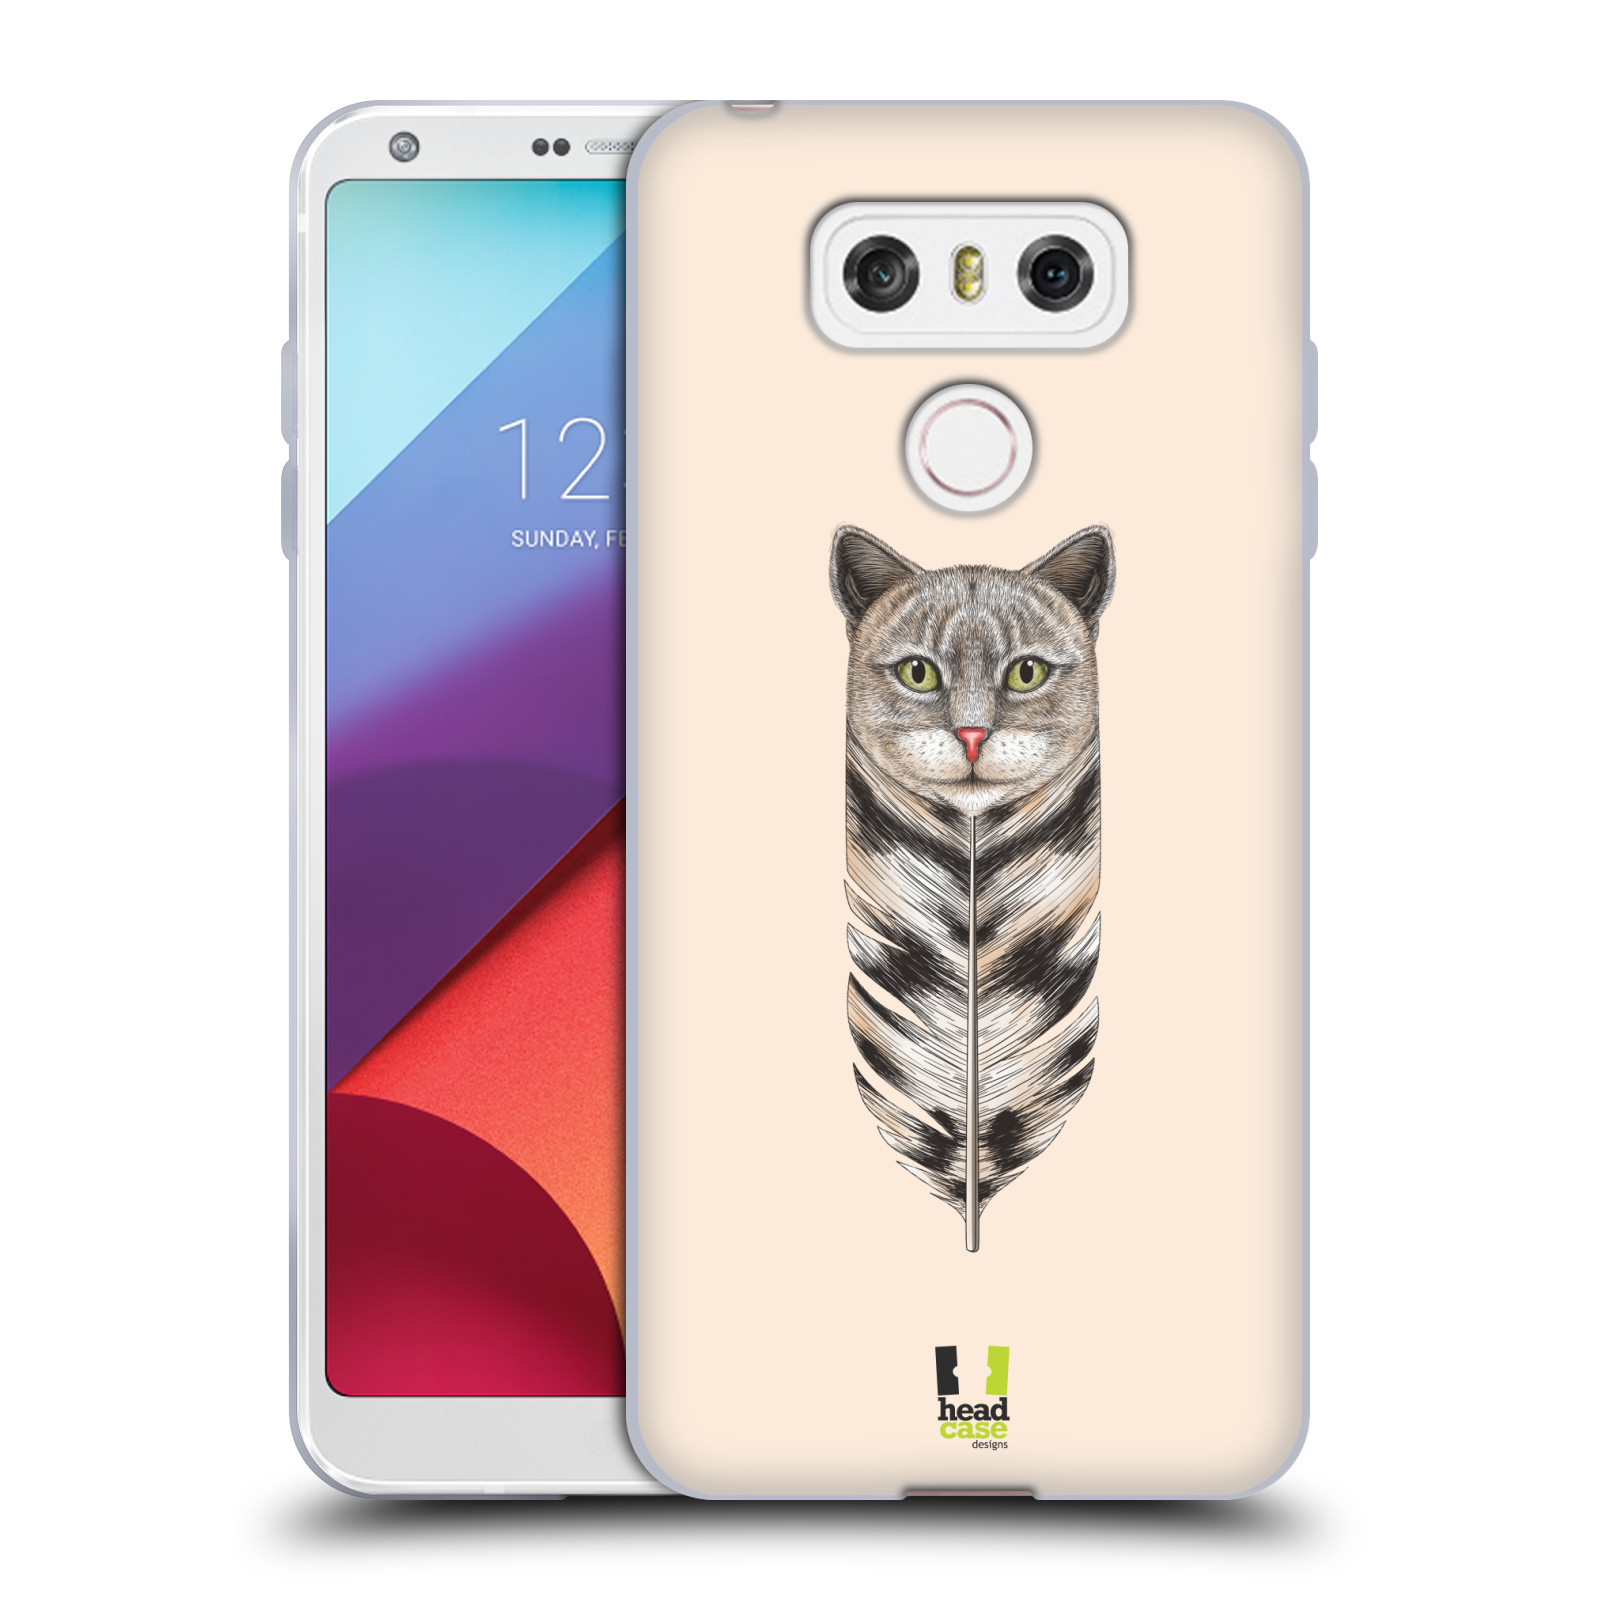 Silikonové pouzdro na mobil LG G6 - Head Case PÍRKO KOČKA (Silikonový kryt či obal na mobilní telefon LG G6 H870 / LG G6 Dual SIM H870DS)